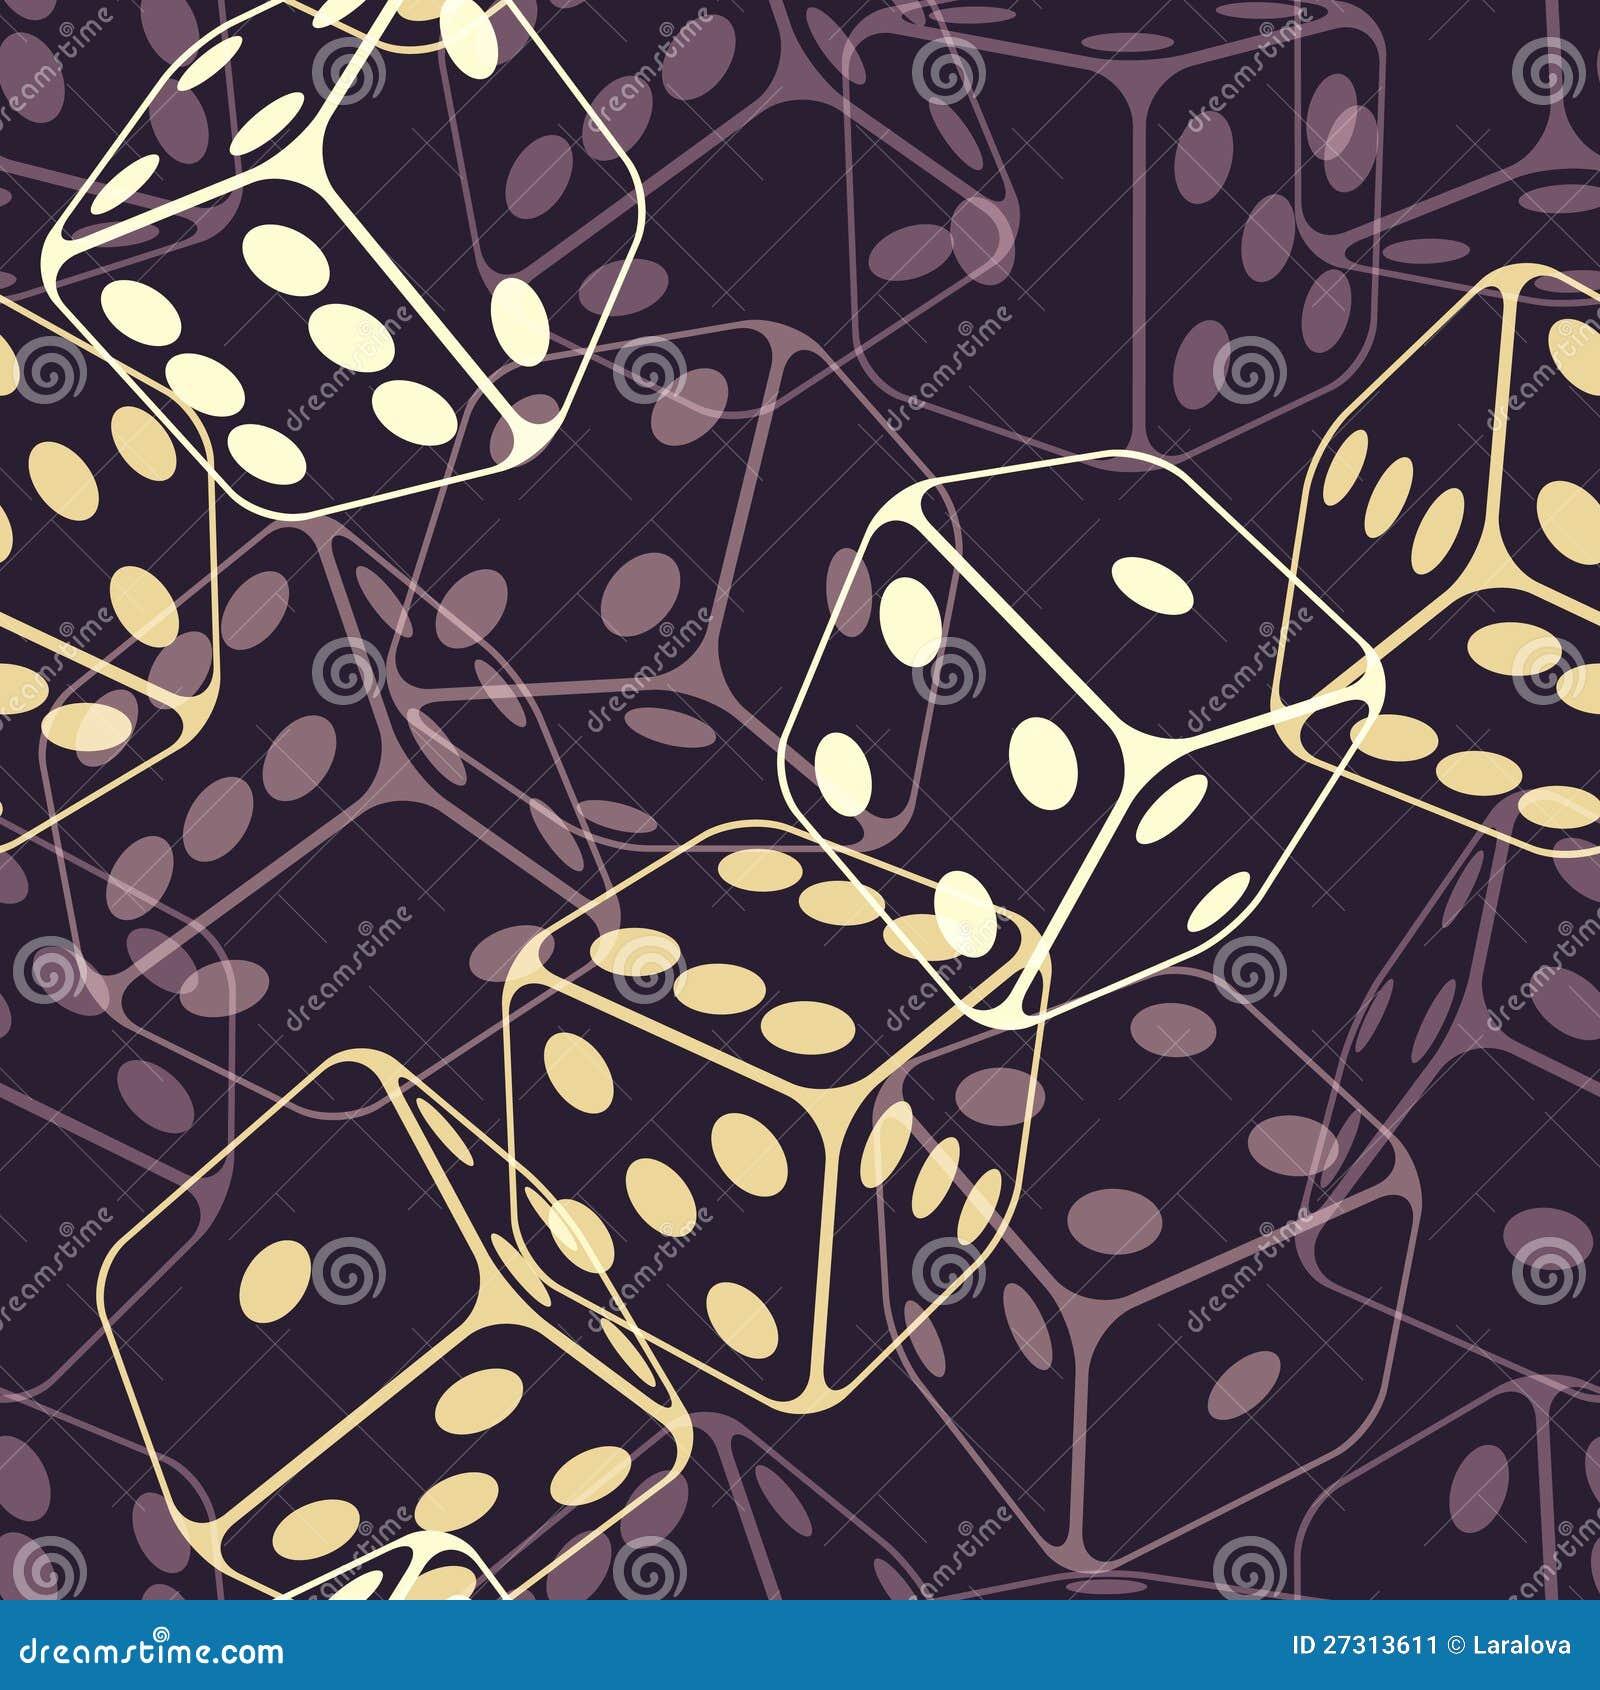 Minimum 5 deposit poker